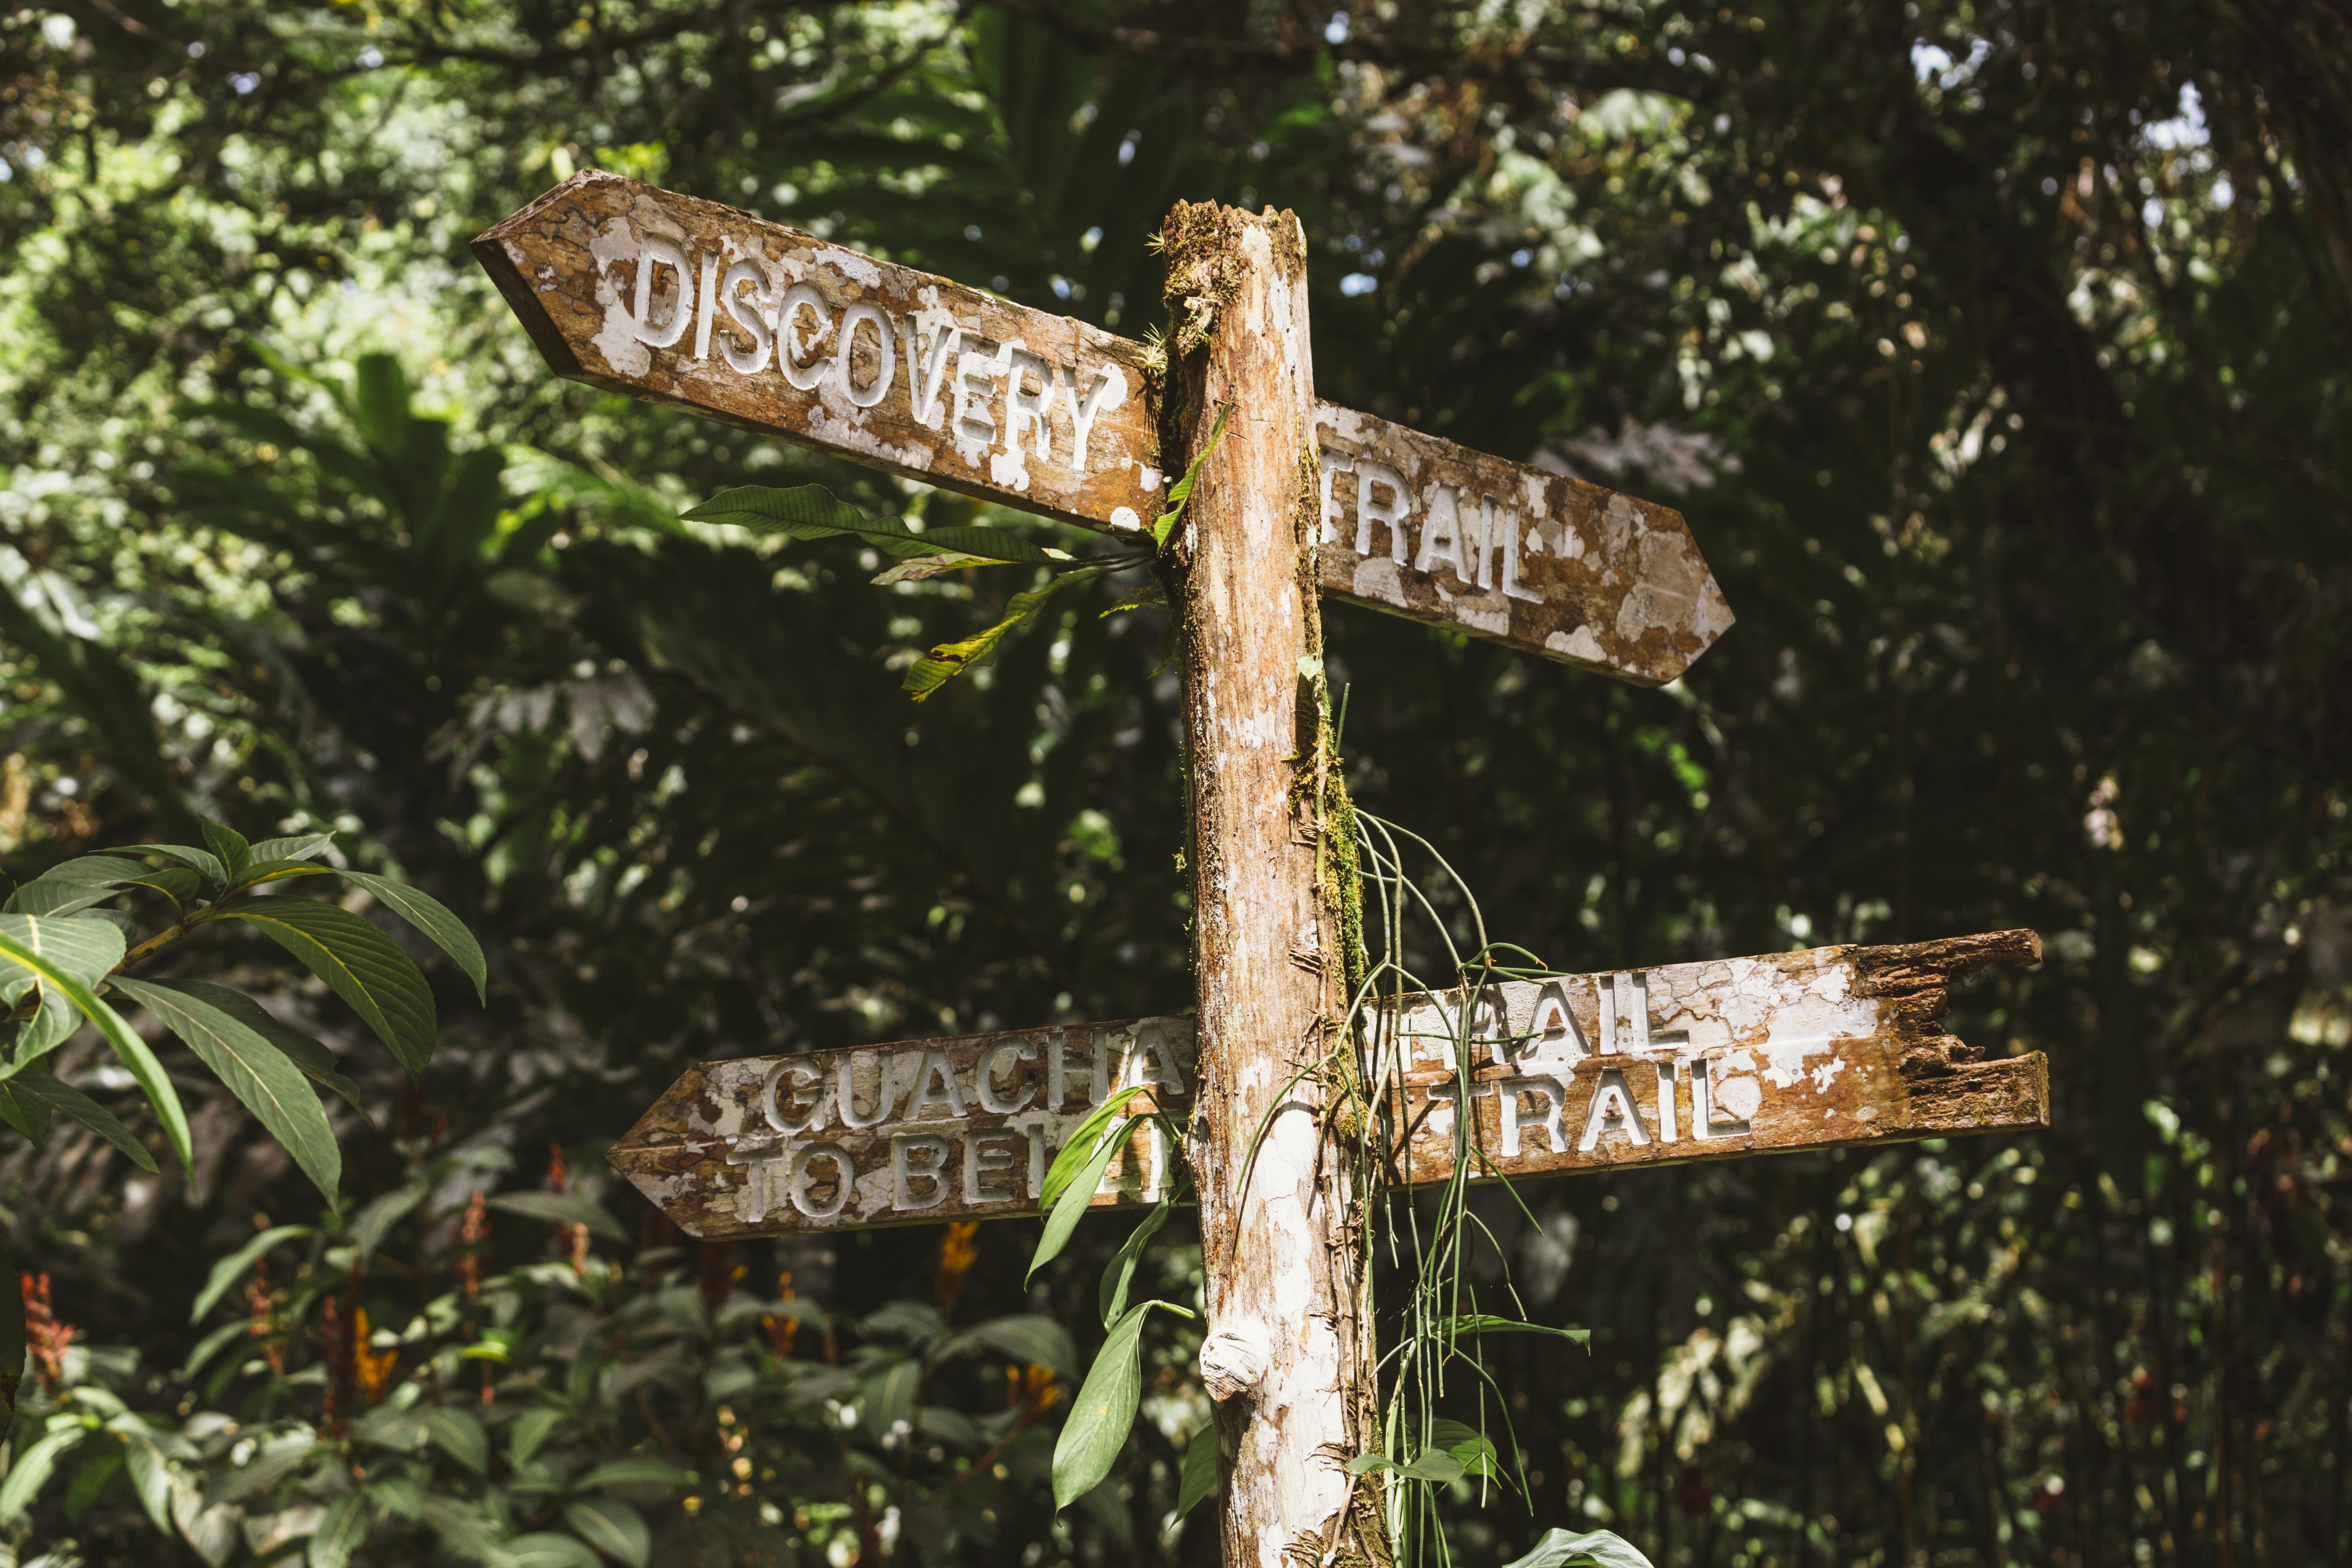 Trinidad, Arima Valley, Asa Wright Nature Center. Aging signpost at nature center.